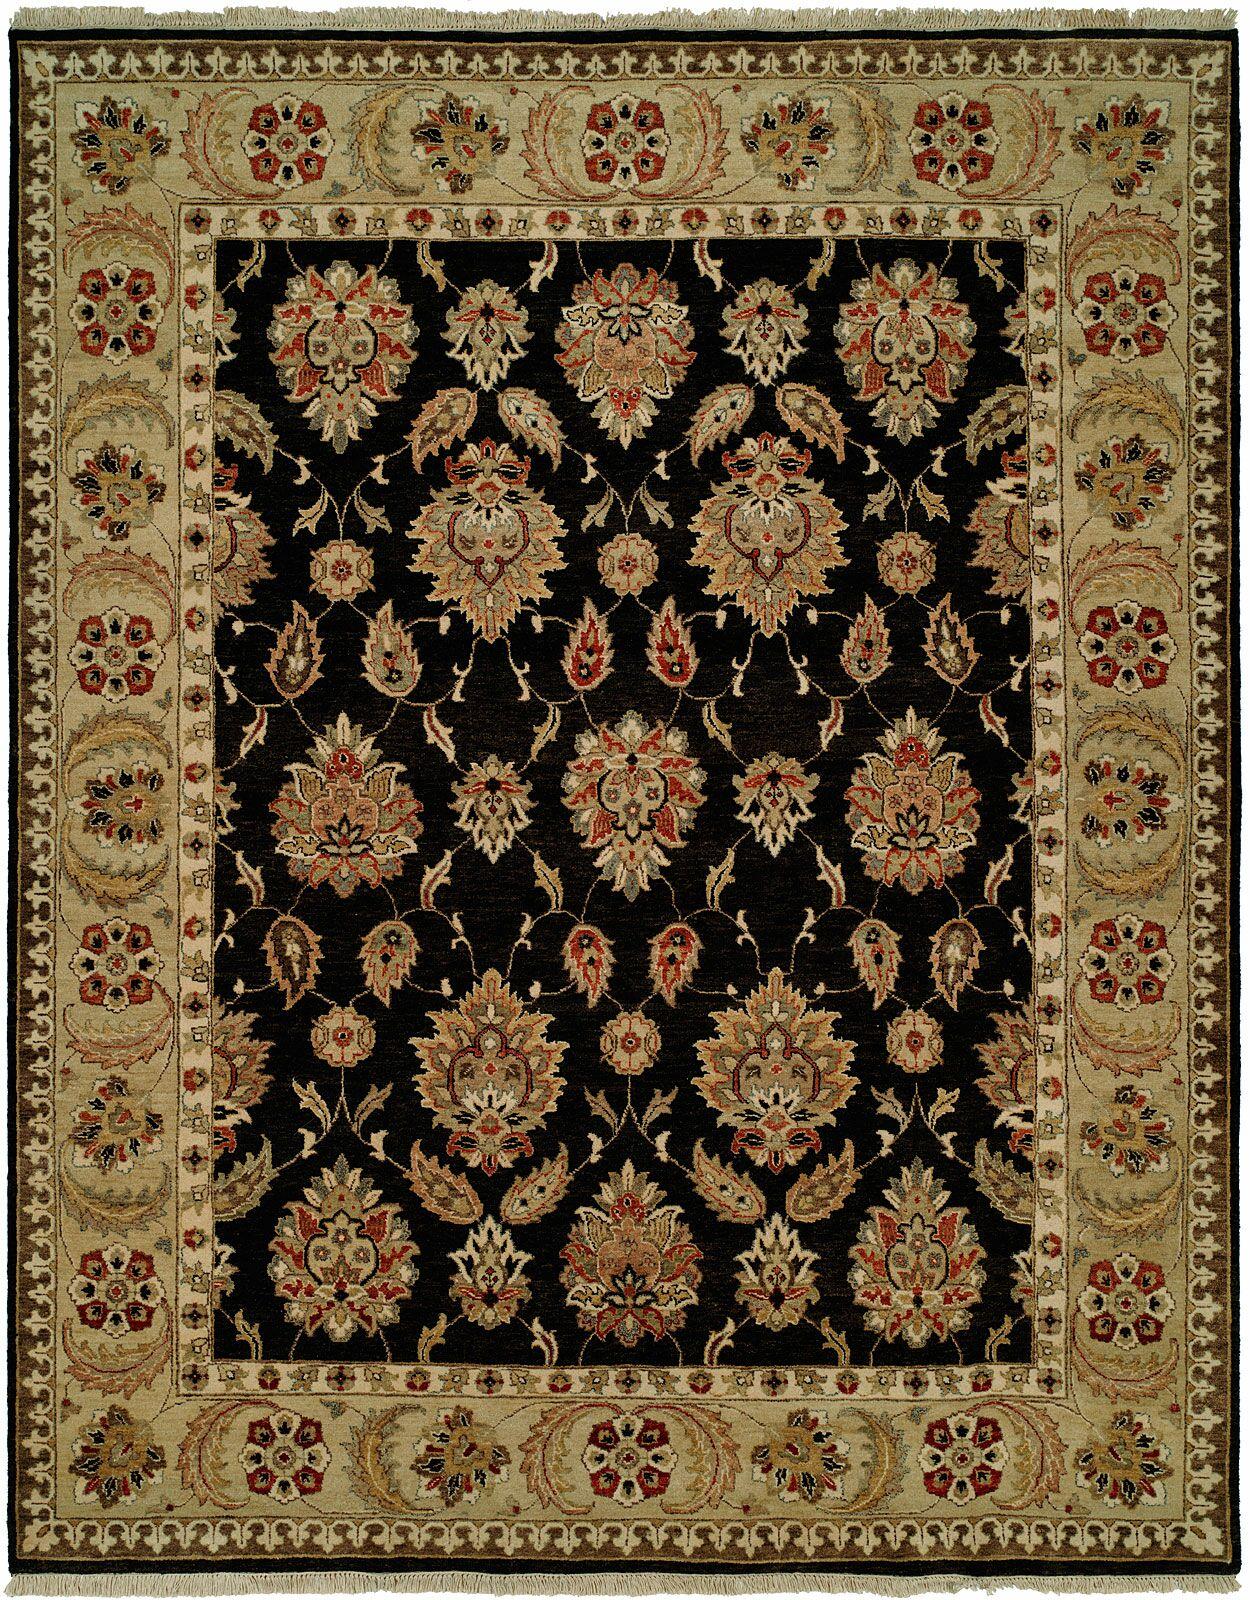 Legazpi Hand-Knotted Black/Gold Area Rug Rug Size: Rectangle 6' x 9'